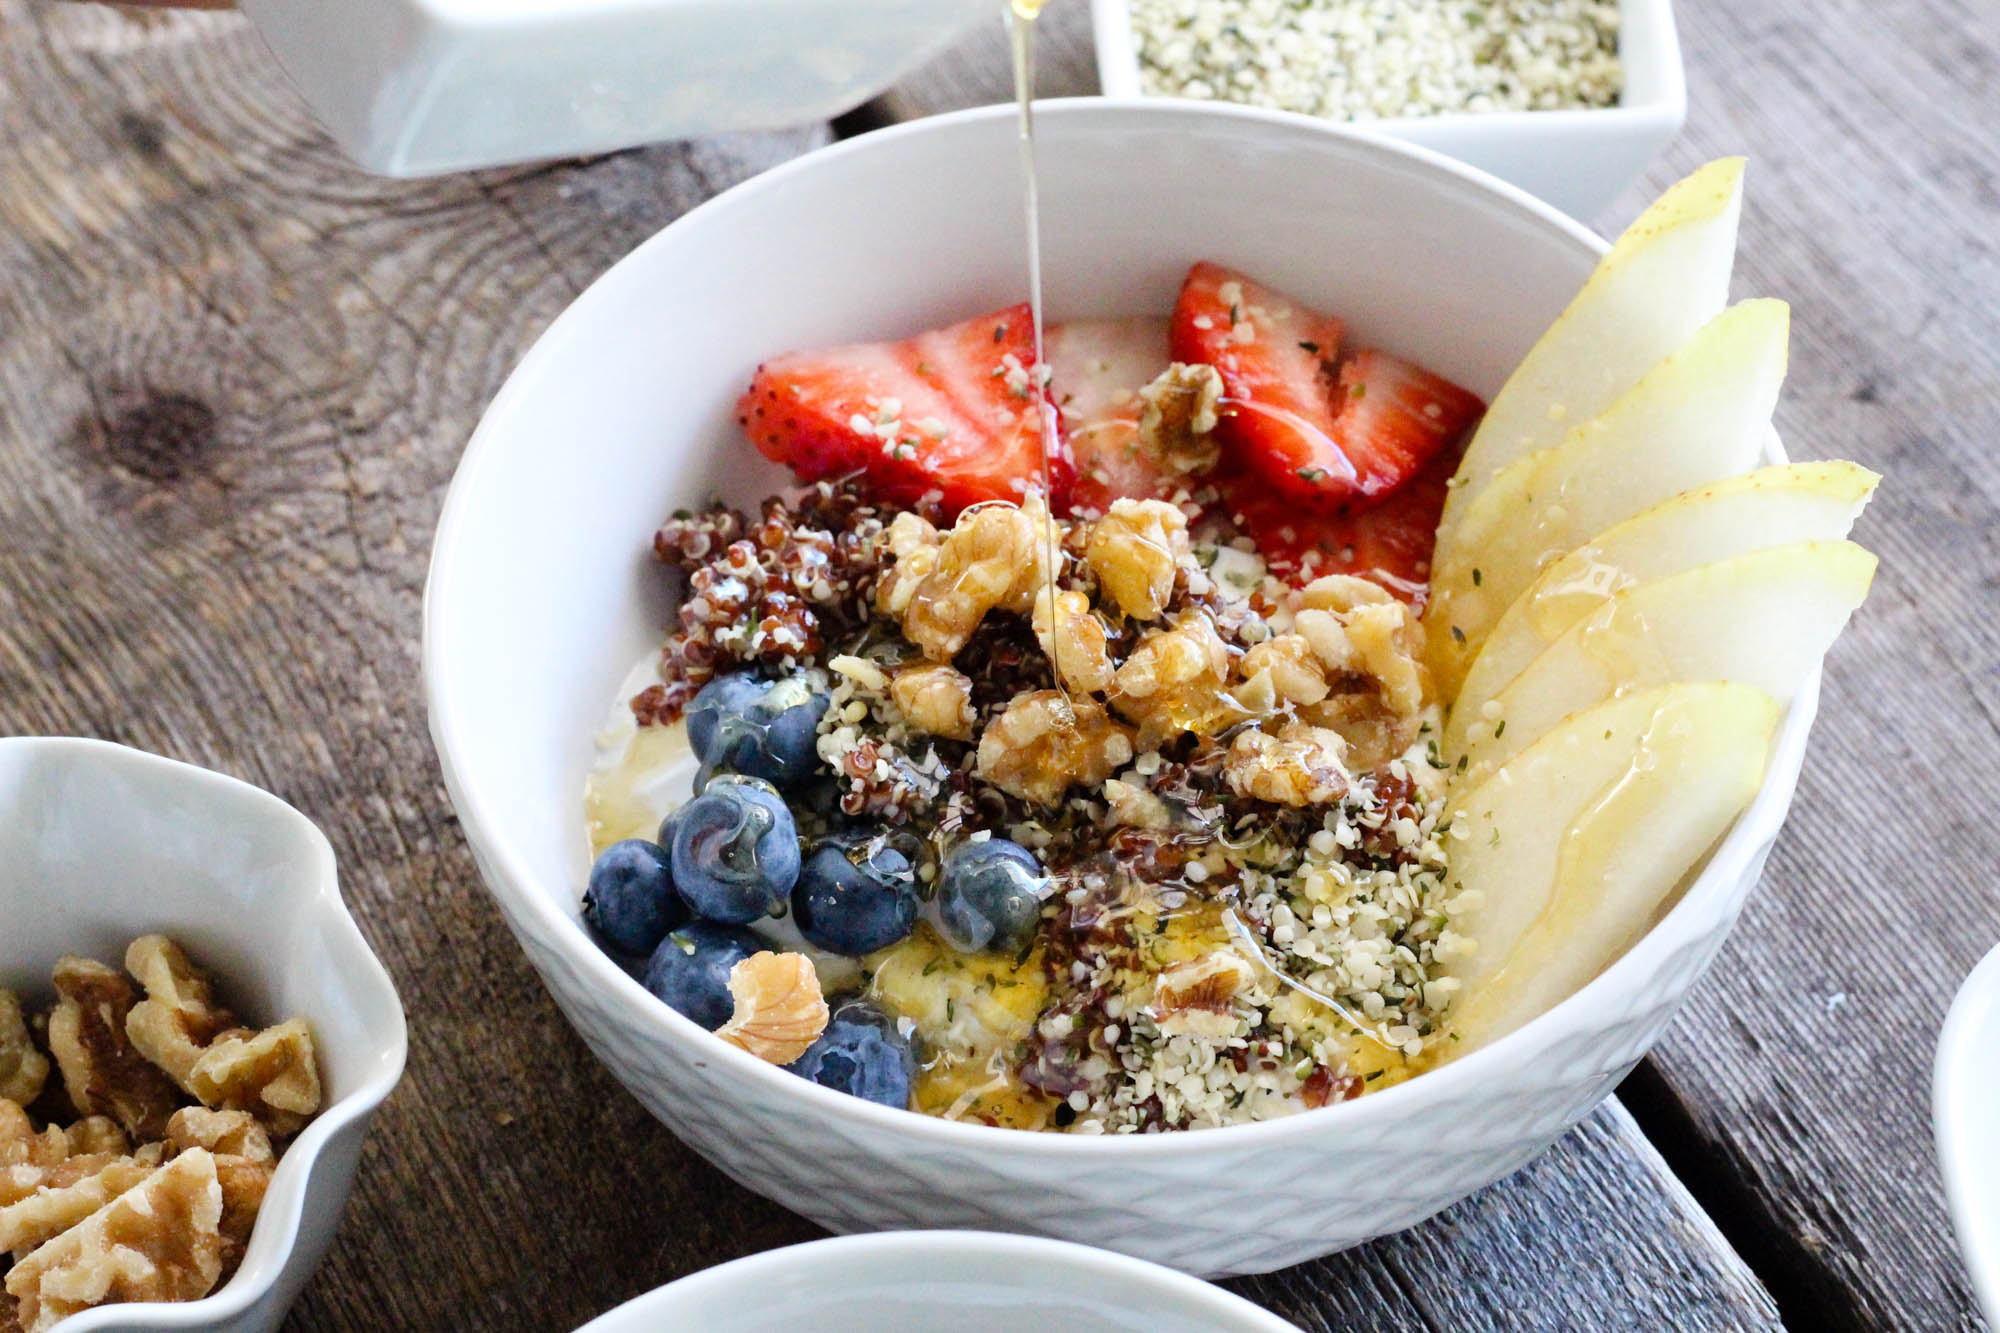 red-quinoa-hemp-hearts-fruit-smoothie-bowl-24